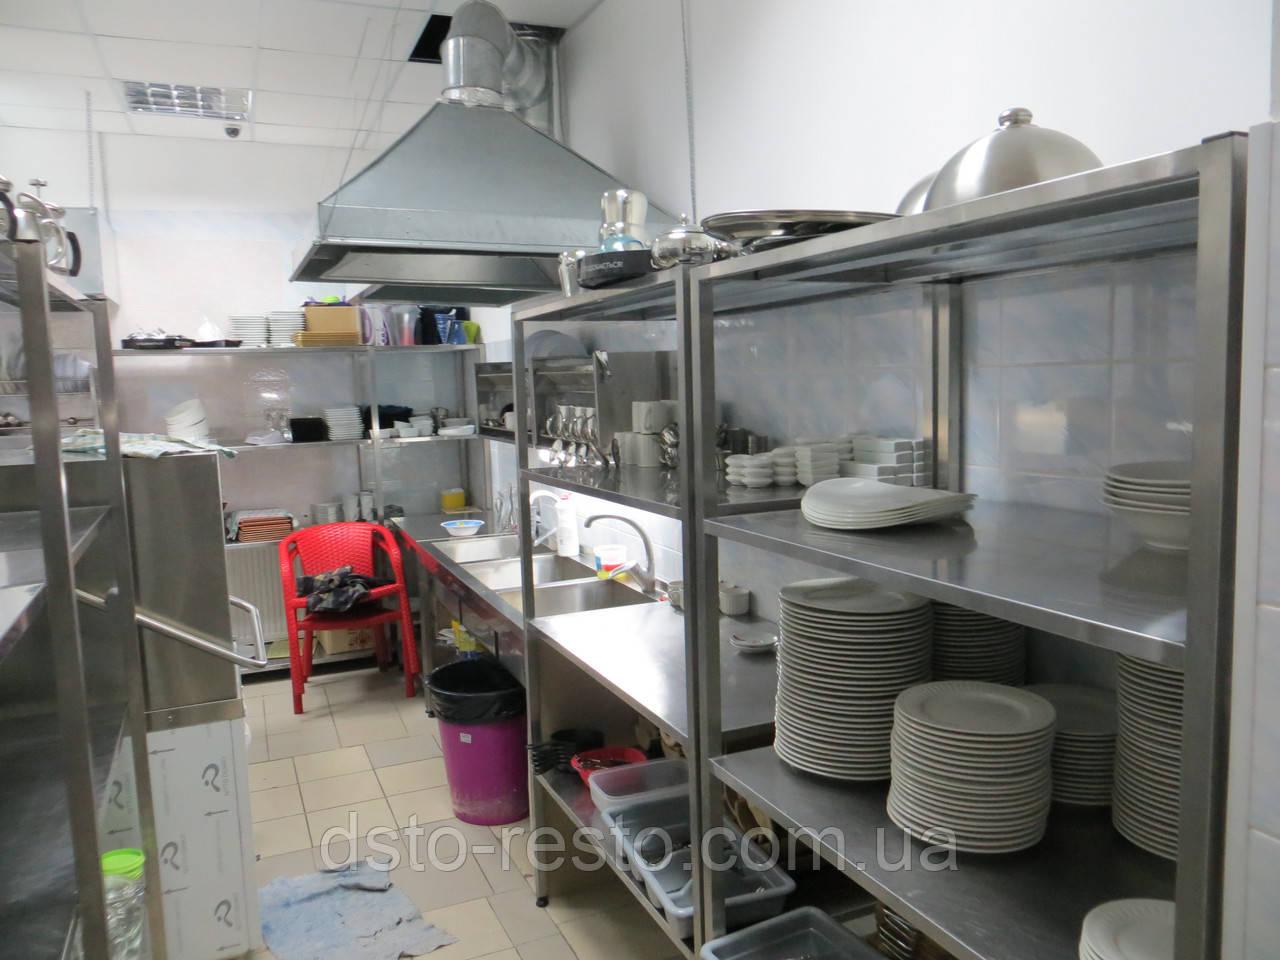 Стеллаж для кухни ресторана кафе 1000/400/1800 мм